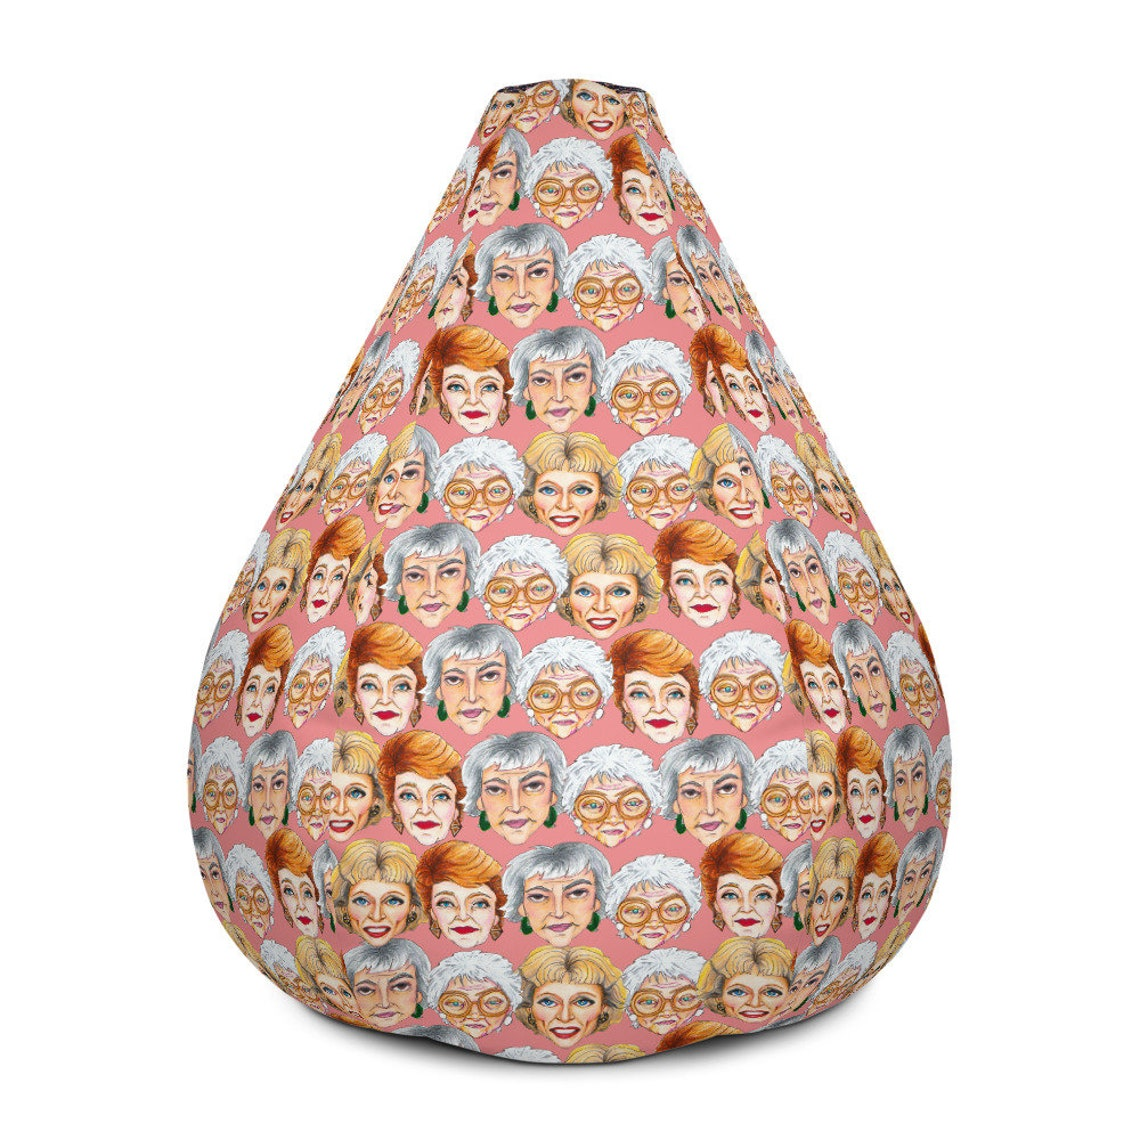 Golden Girls Patterned Illustration Bean Bag Chair w/ filling